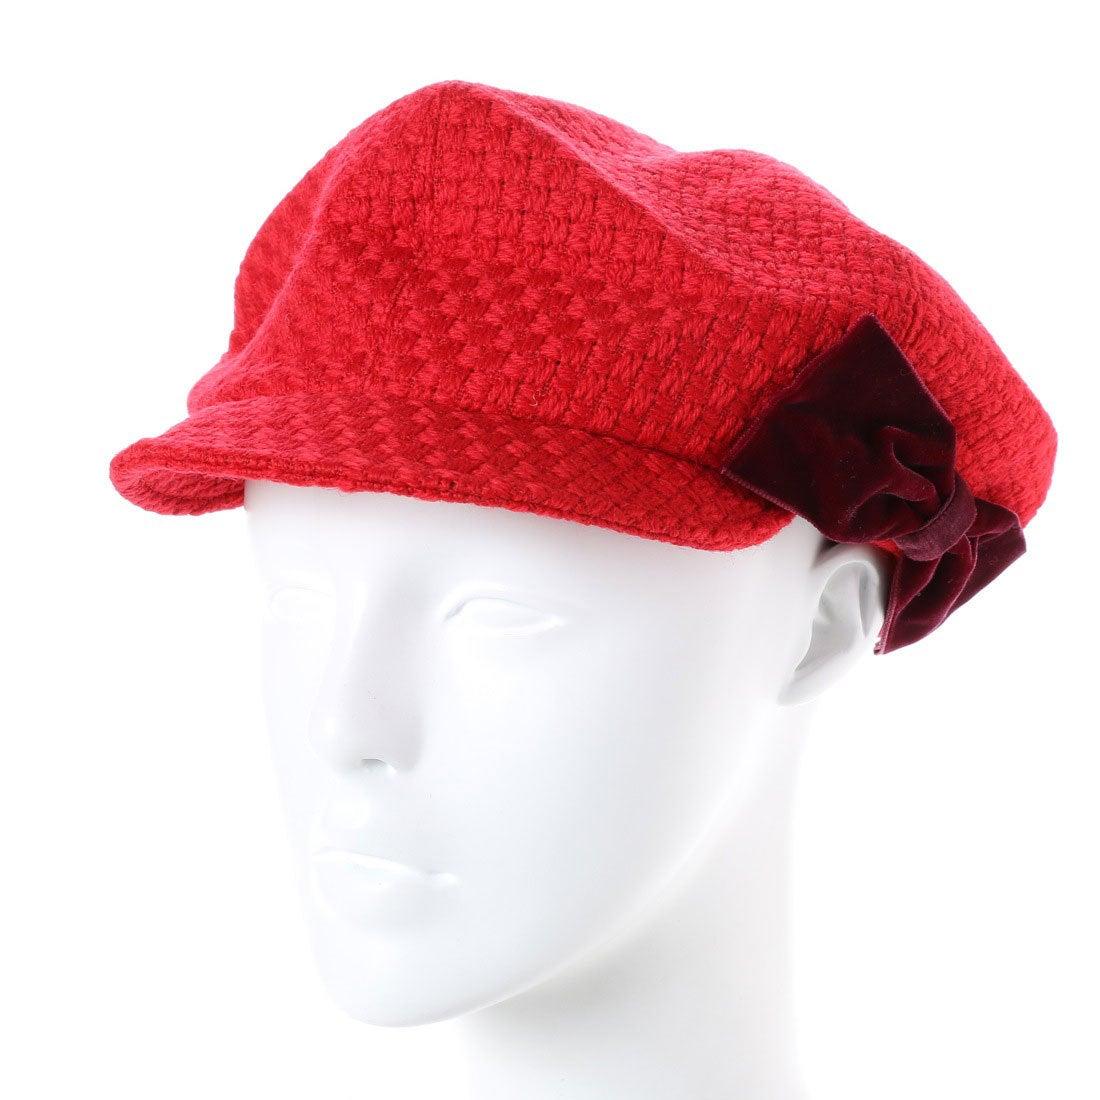 【SALE 70%OFF】セレク コレクション CELEC COLLECTION りぼんキャスケット帽子 (レッド)